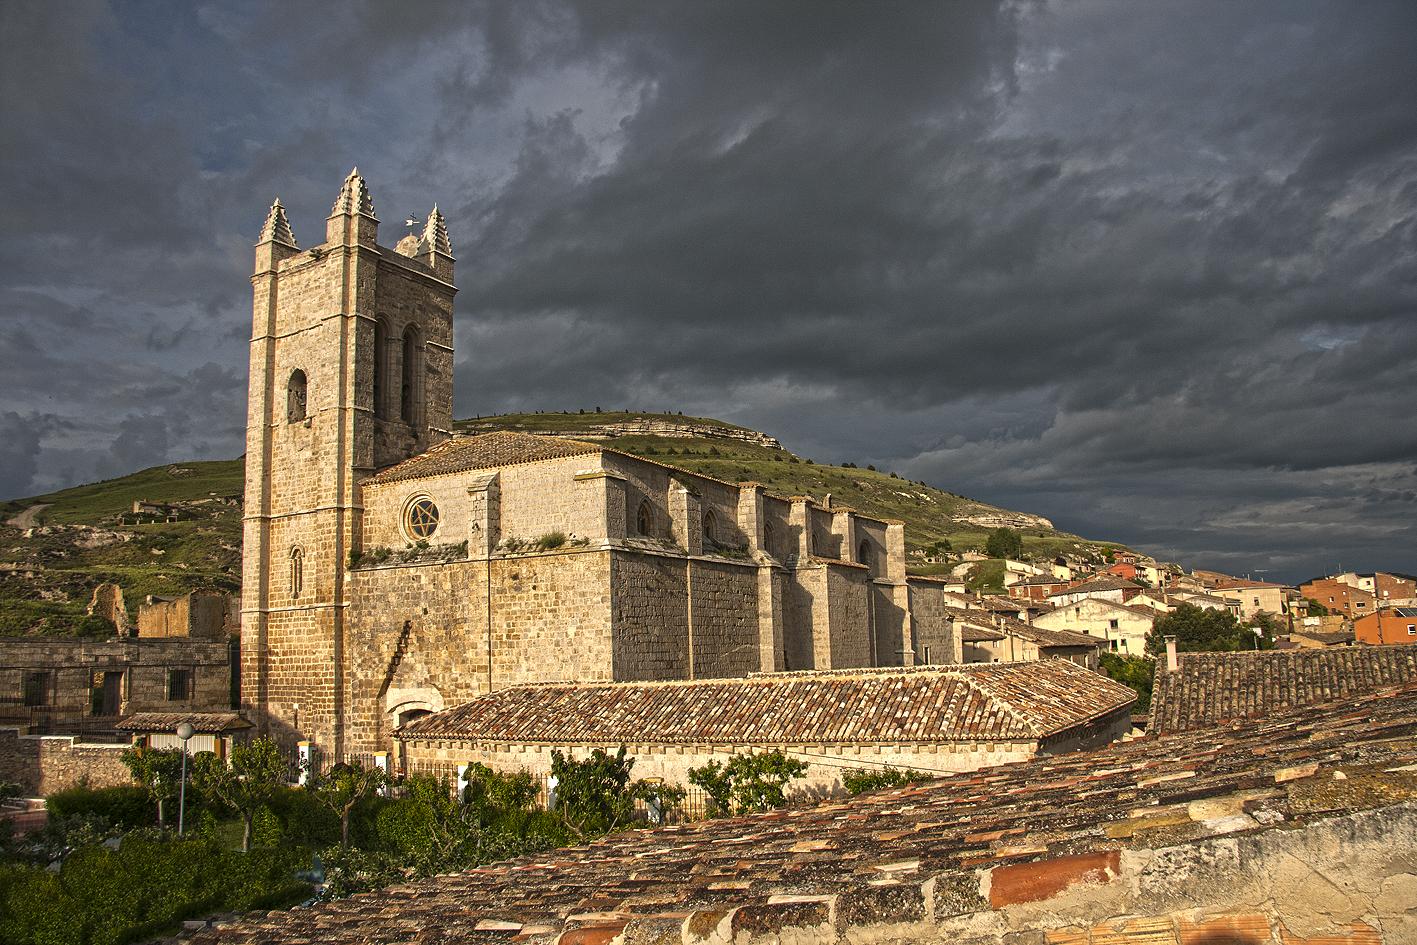 Iglesia-San-juan05-Castrojeriz